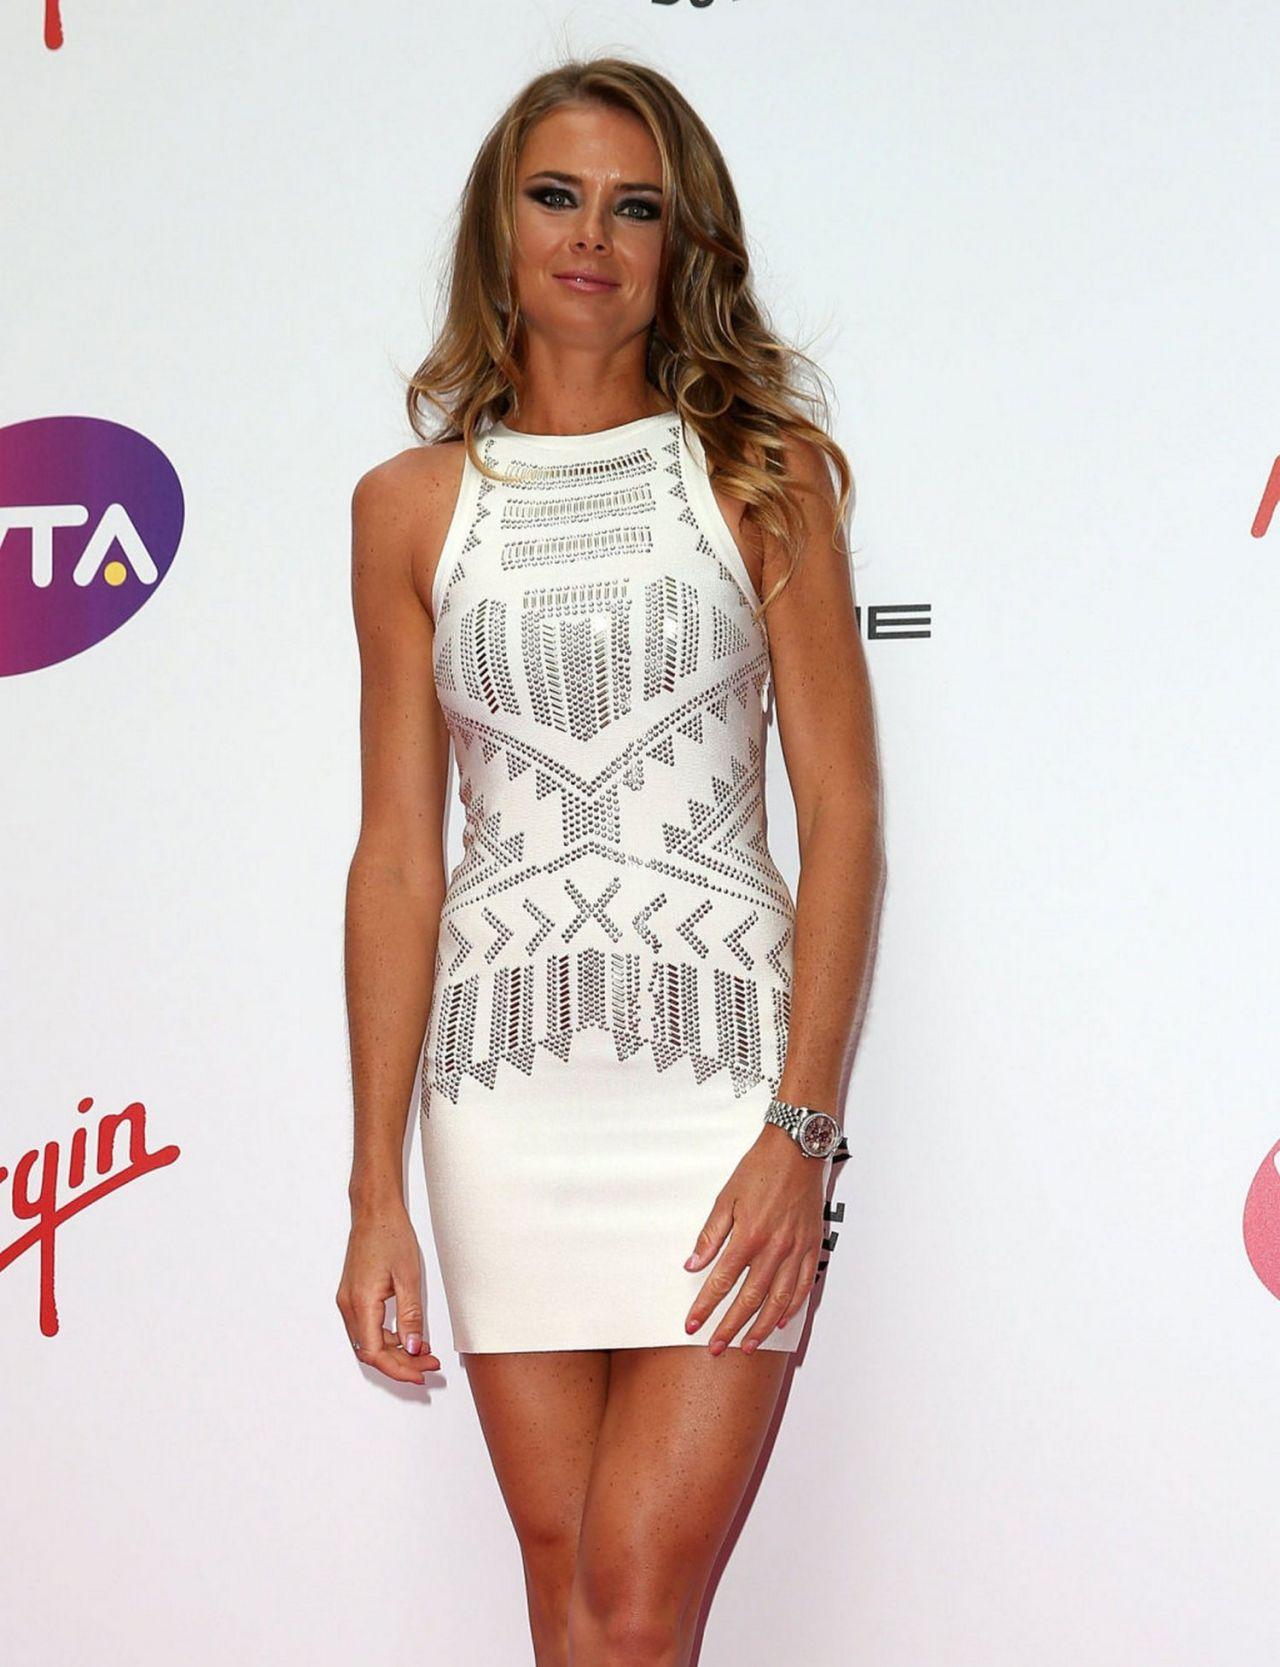 Daniela Hantuchova – WTA Pre-Wimbledon 2014 Party in London